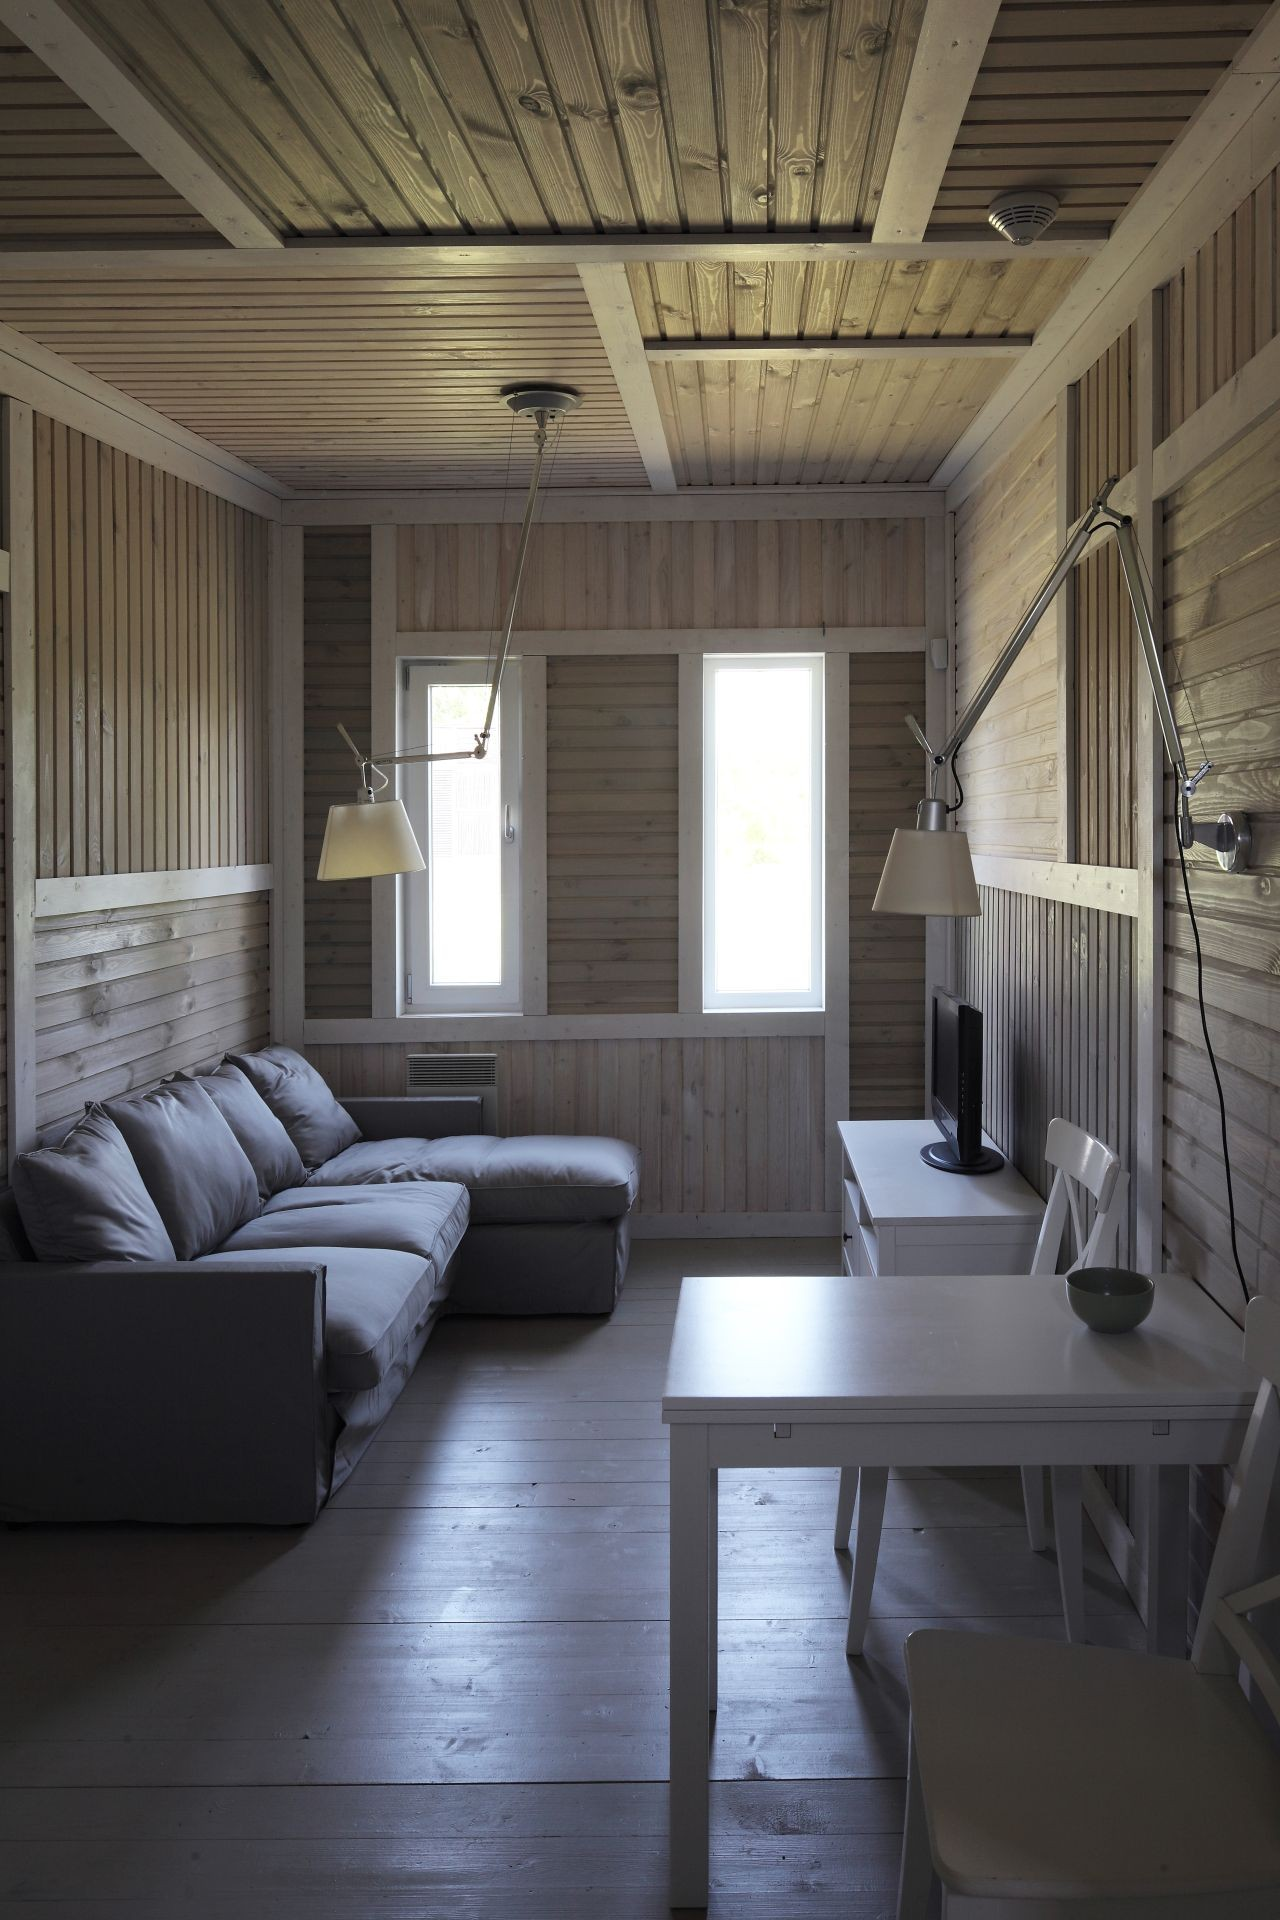 Deco Pattern House / Peter Kostelov